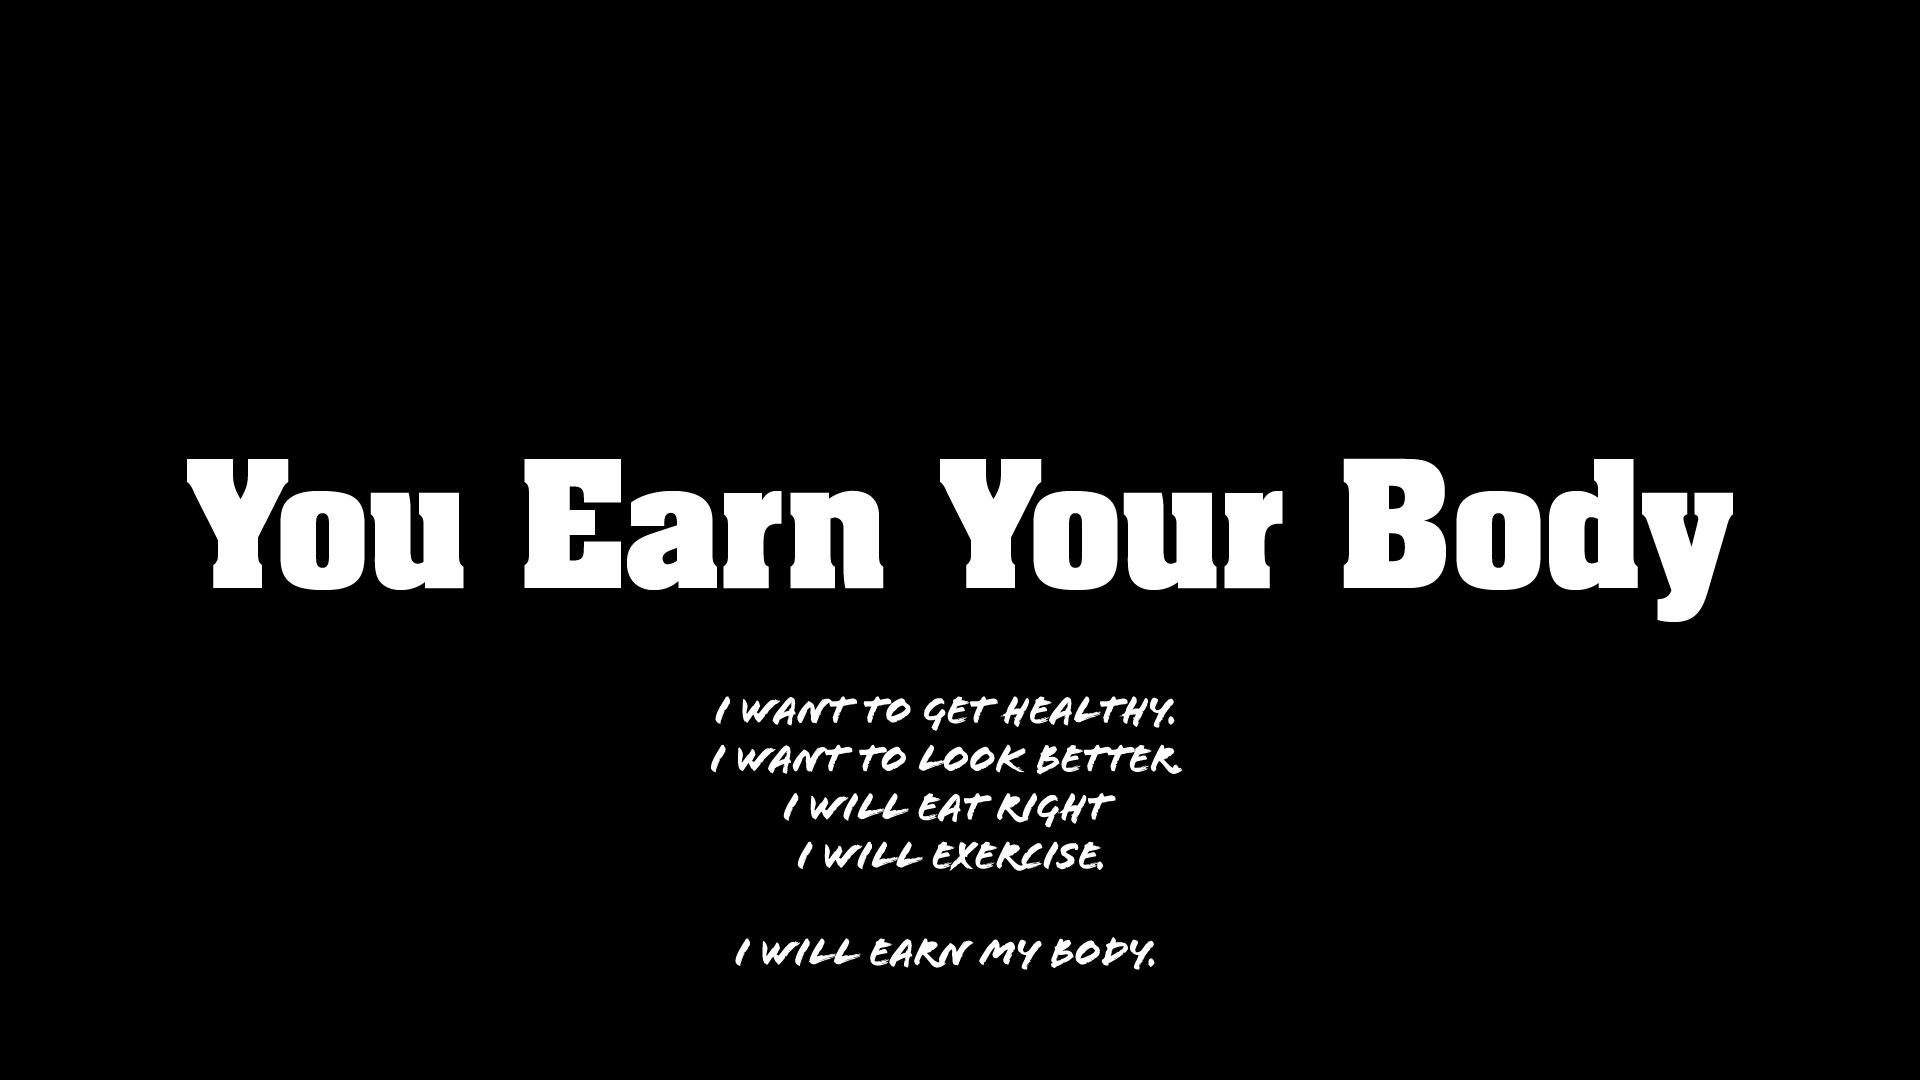 Fitness Motivation wallpaper 50736 1920x1080